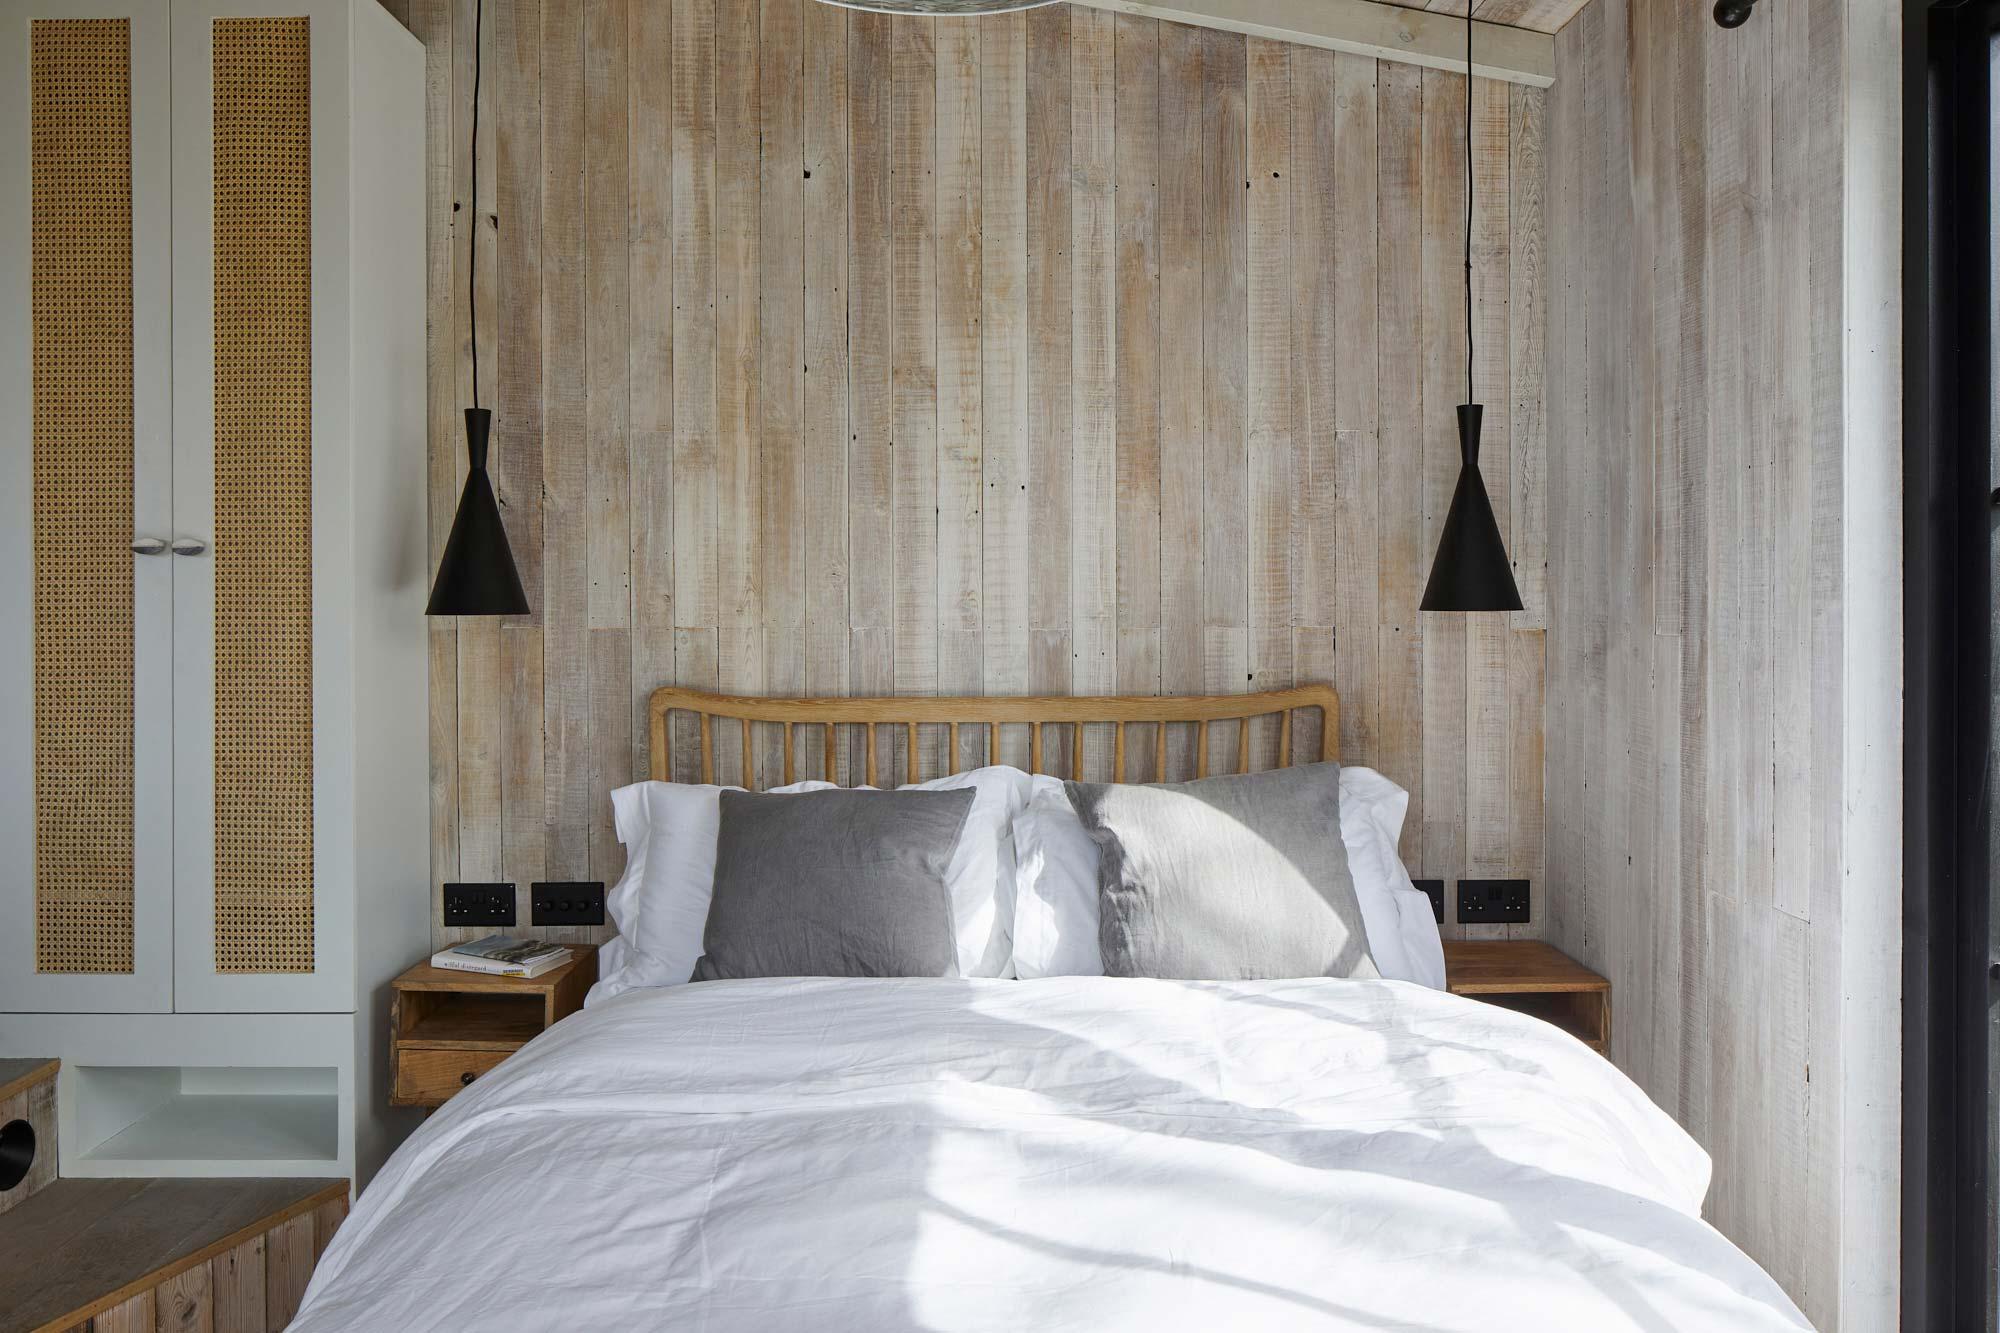 reclaimed timber whitewash walls